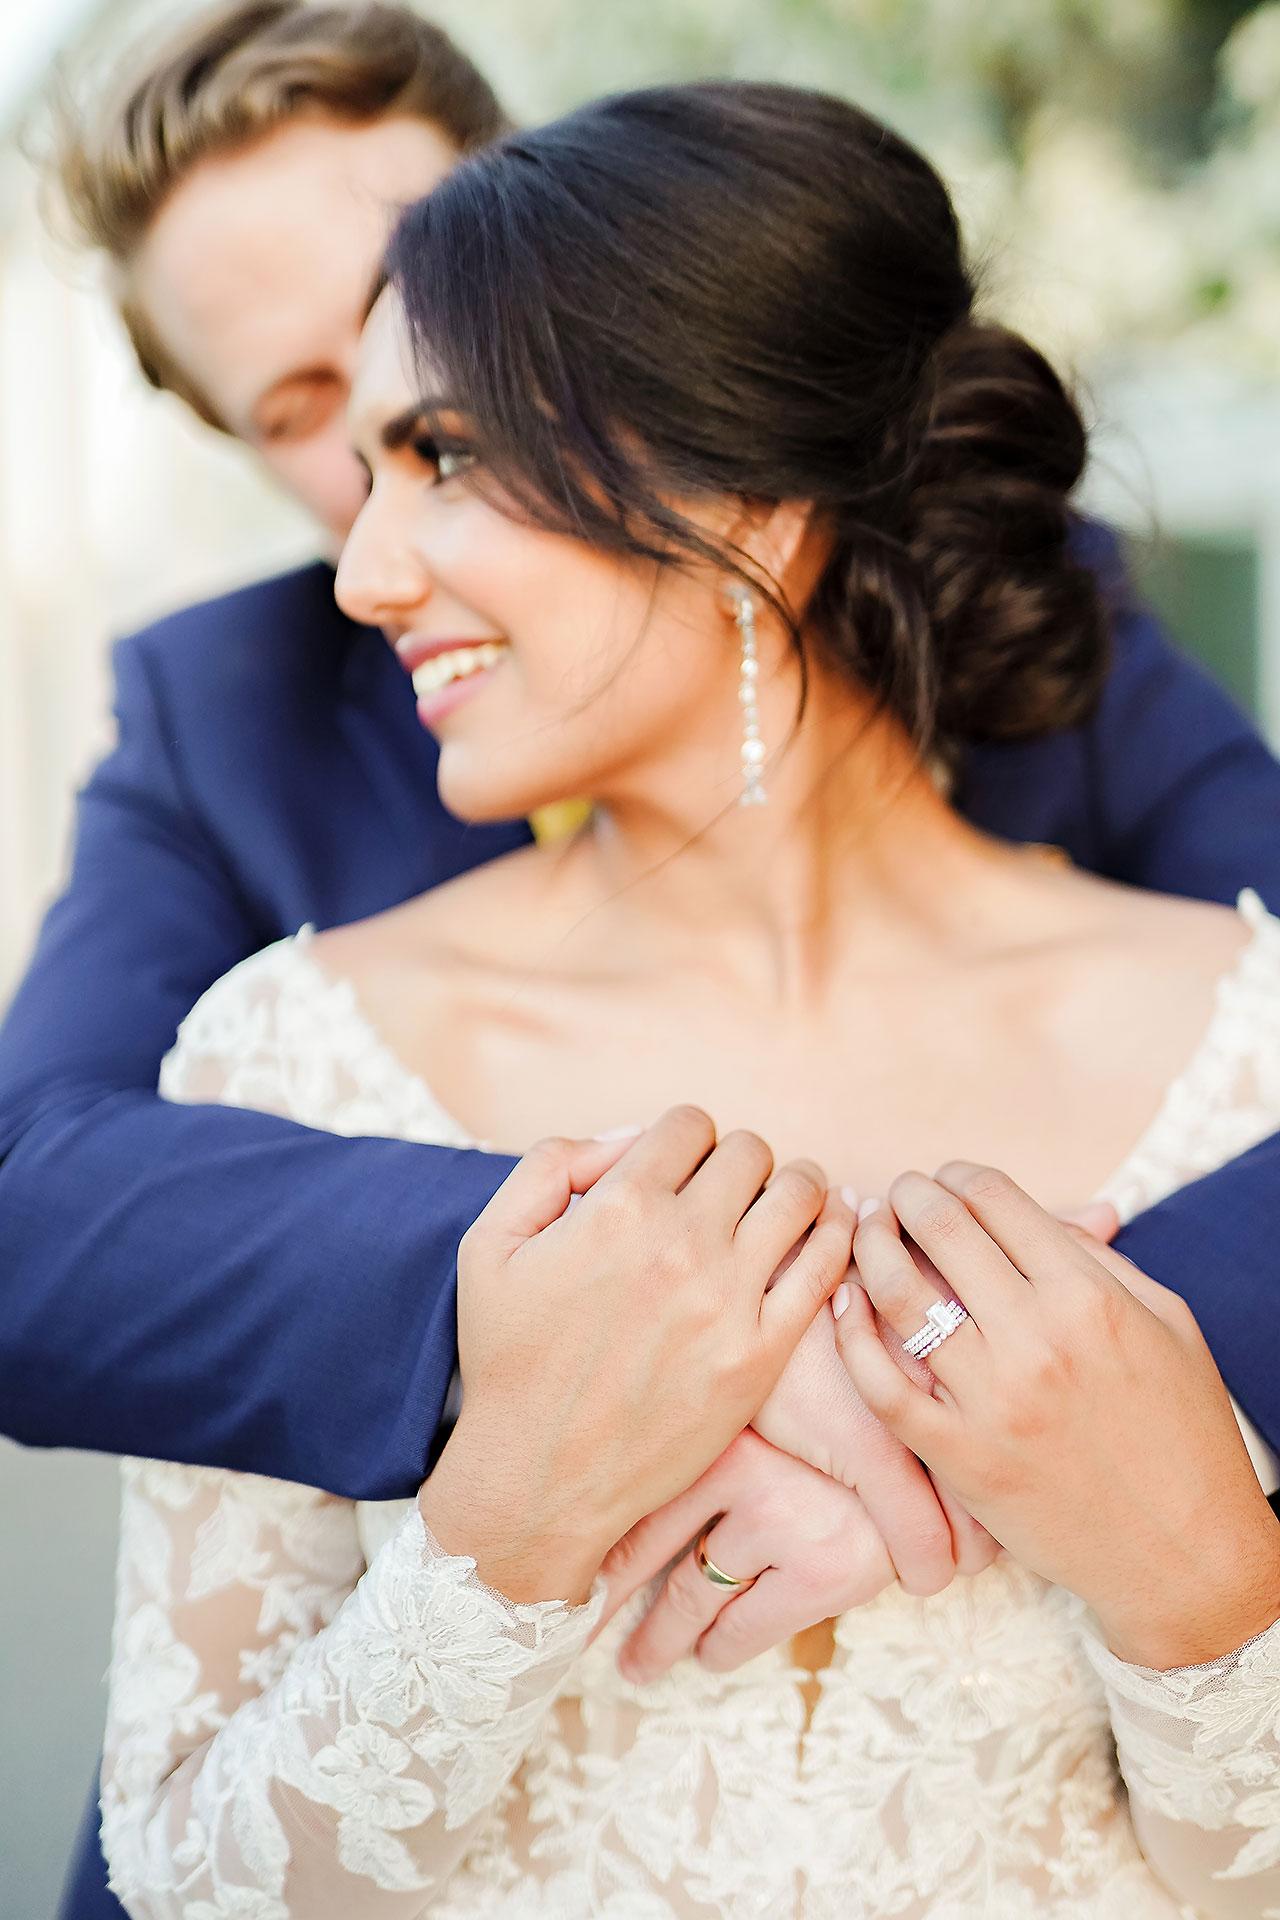 Nadia Parker Black Iris Estate Carmel Indiana Wedding May 2021 261